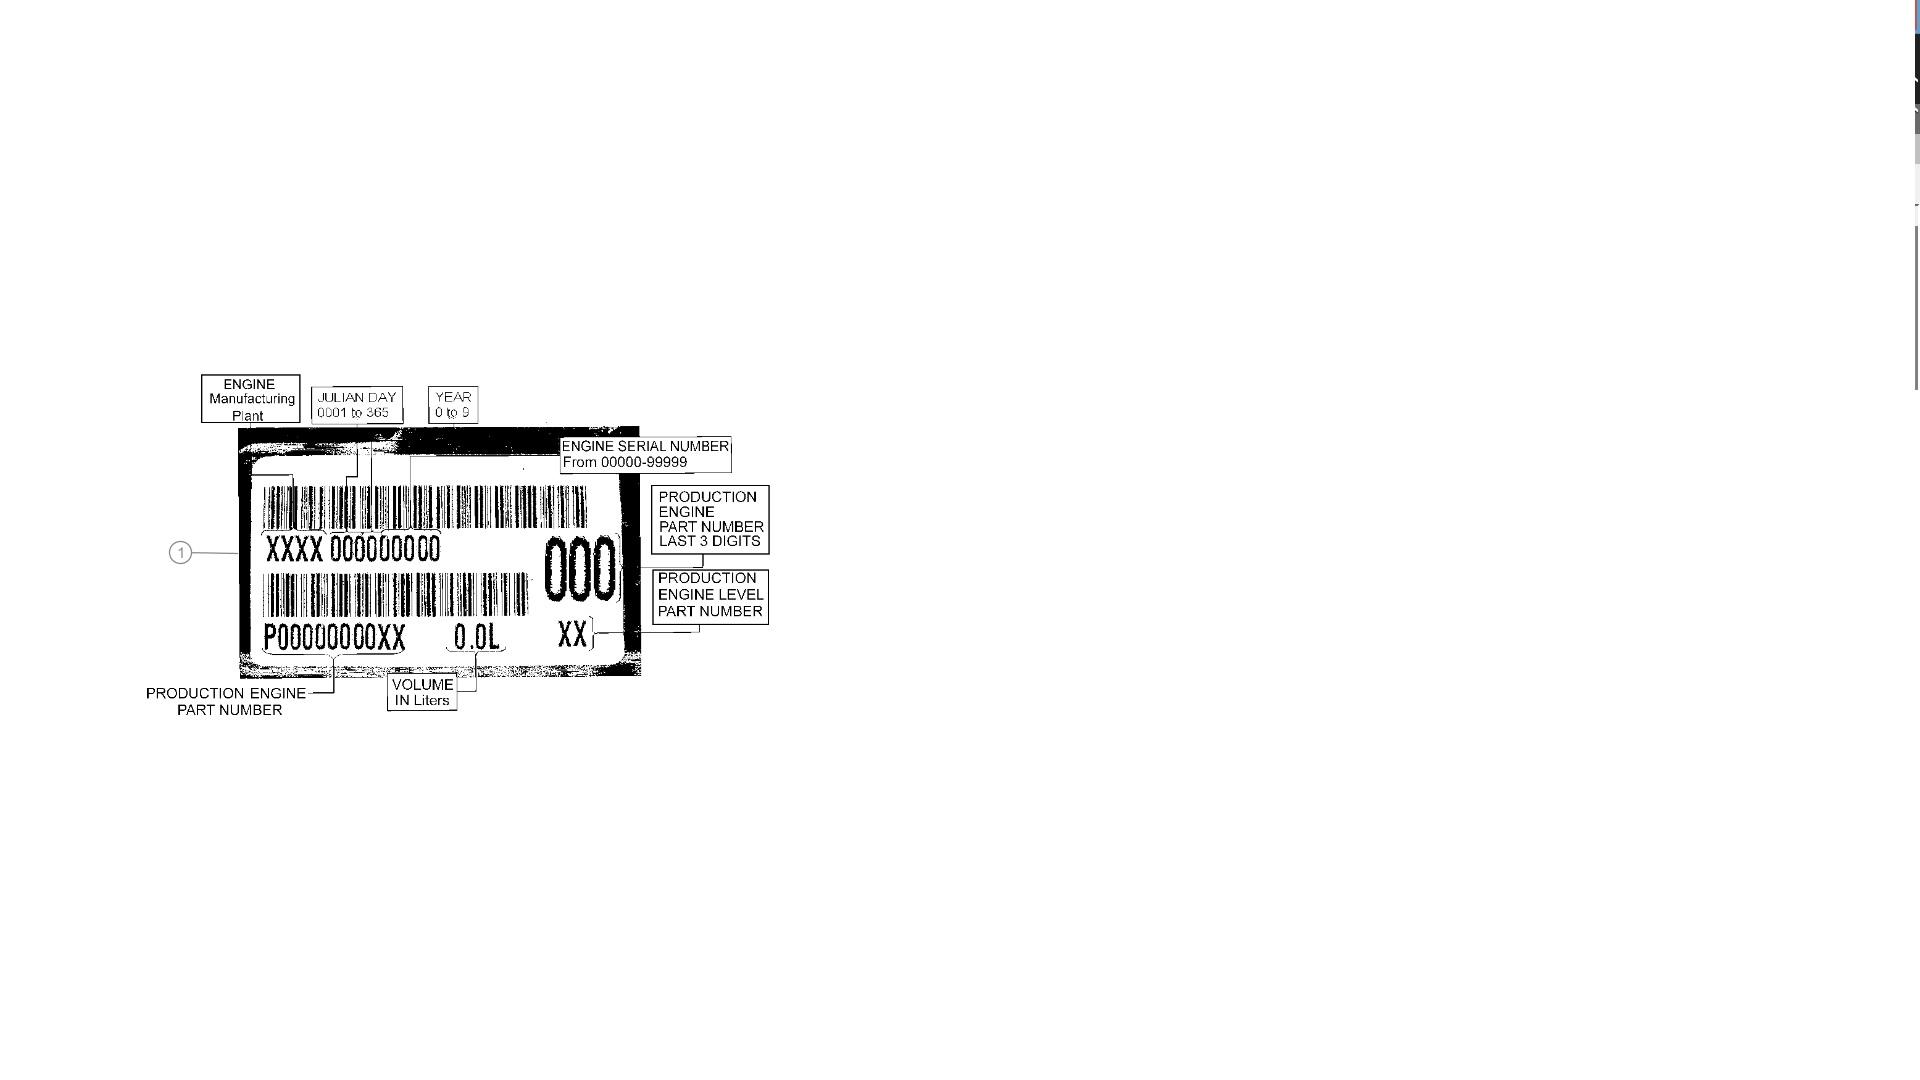 f65db3dd-6d57-440b-a616-4fd2dc9f9238_Engine Serial ID.jpg